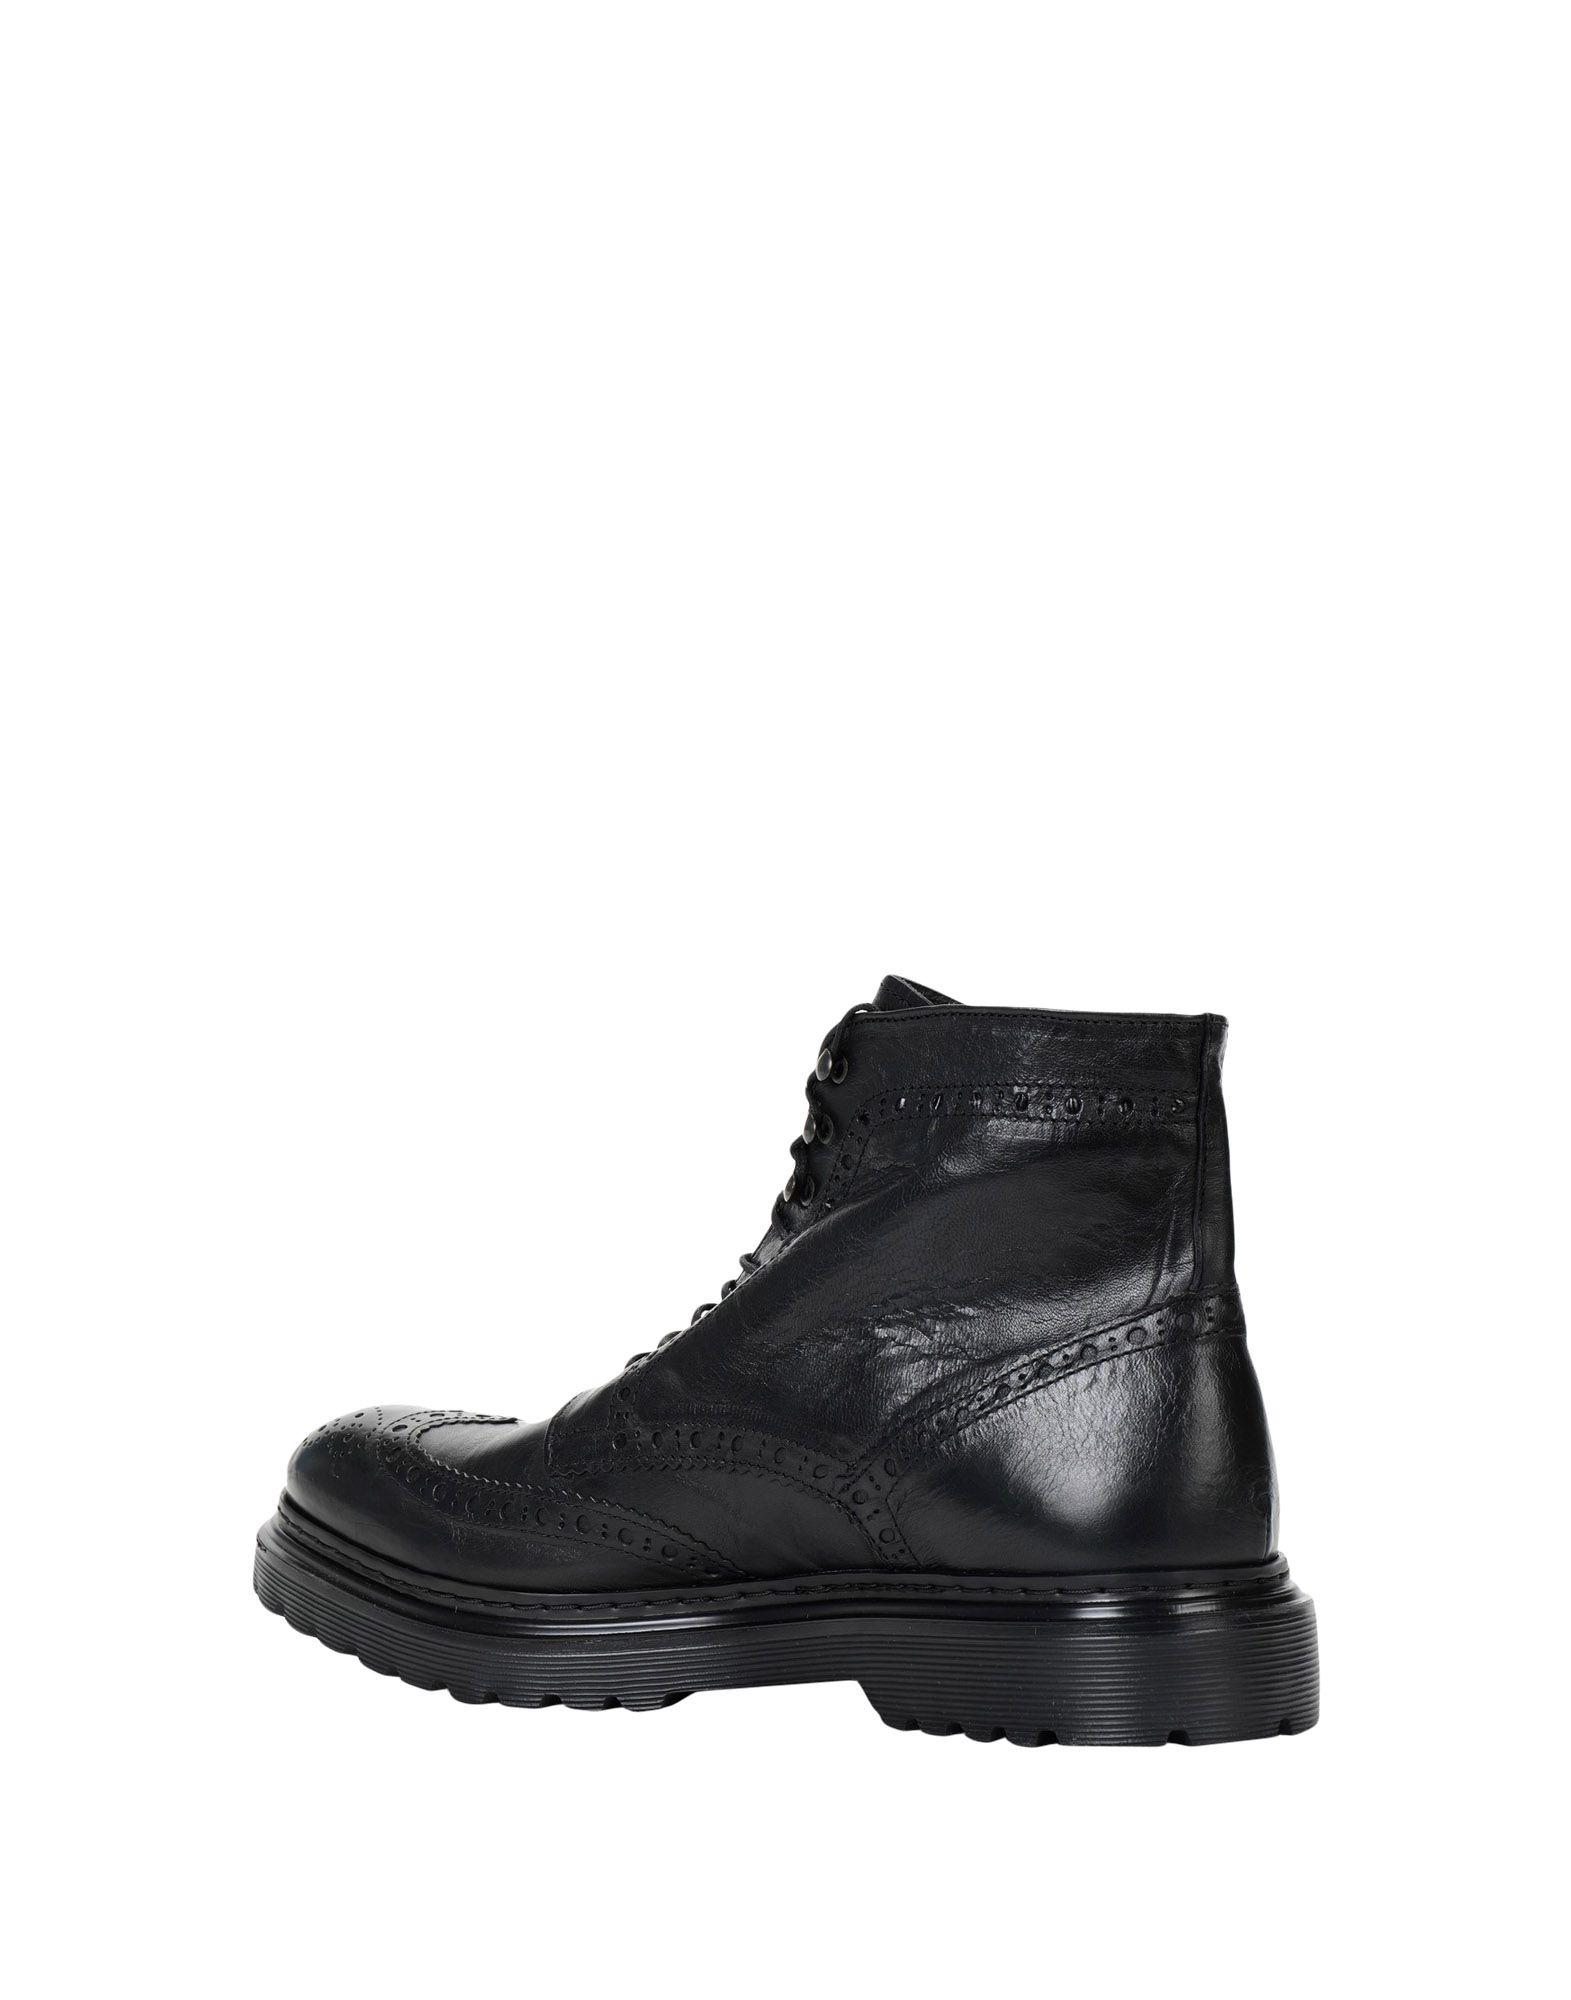 Pawelk's Gute Stiefelette Herren  11524594OP Gute Pawelk's Qualität beliebte Schuhe ecaf61